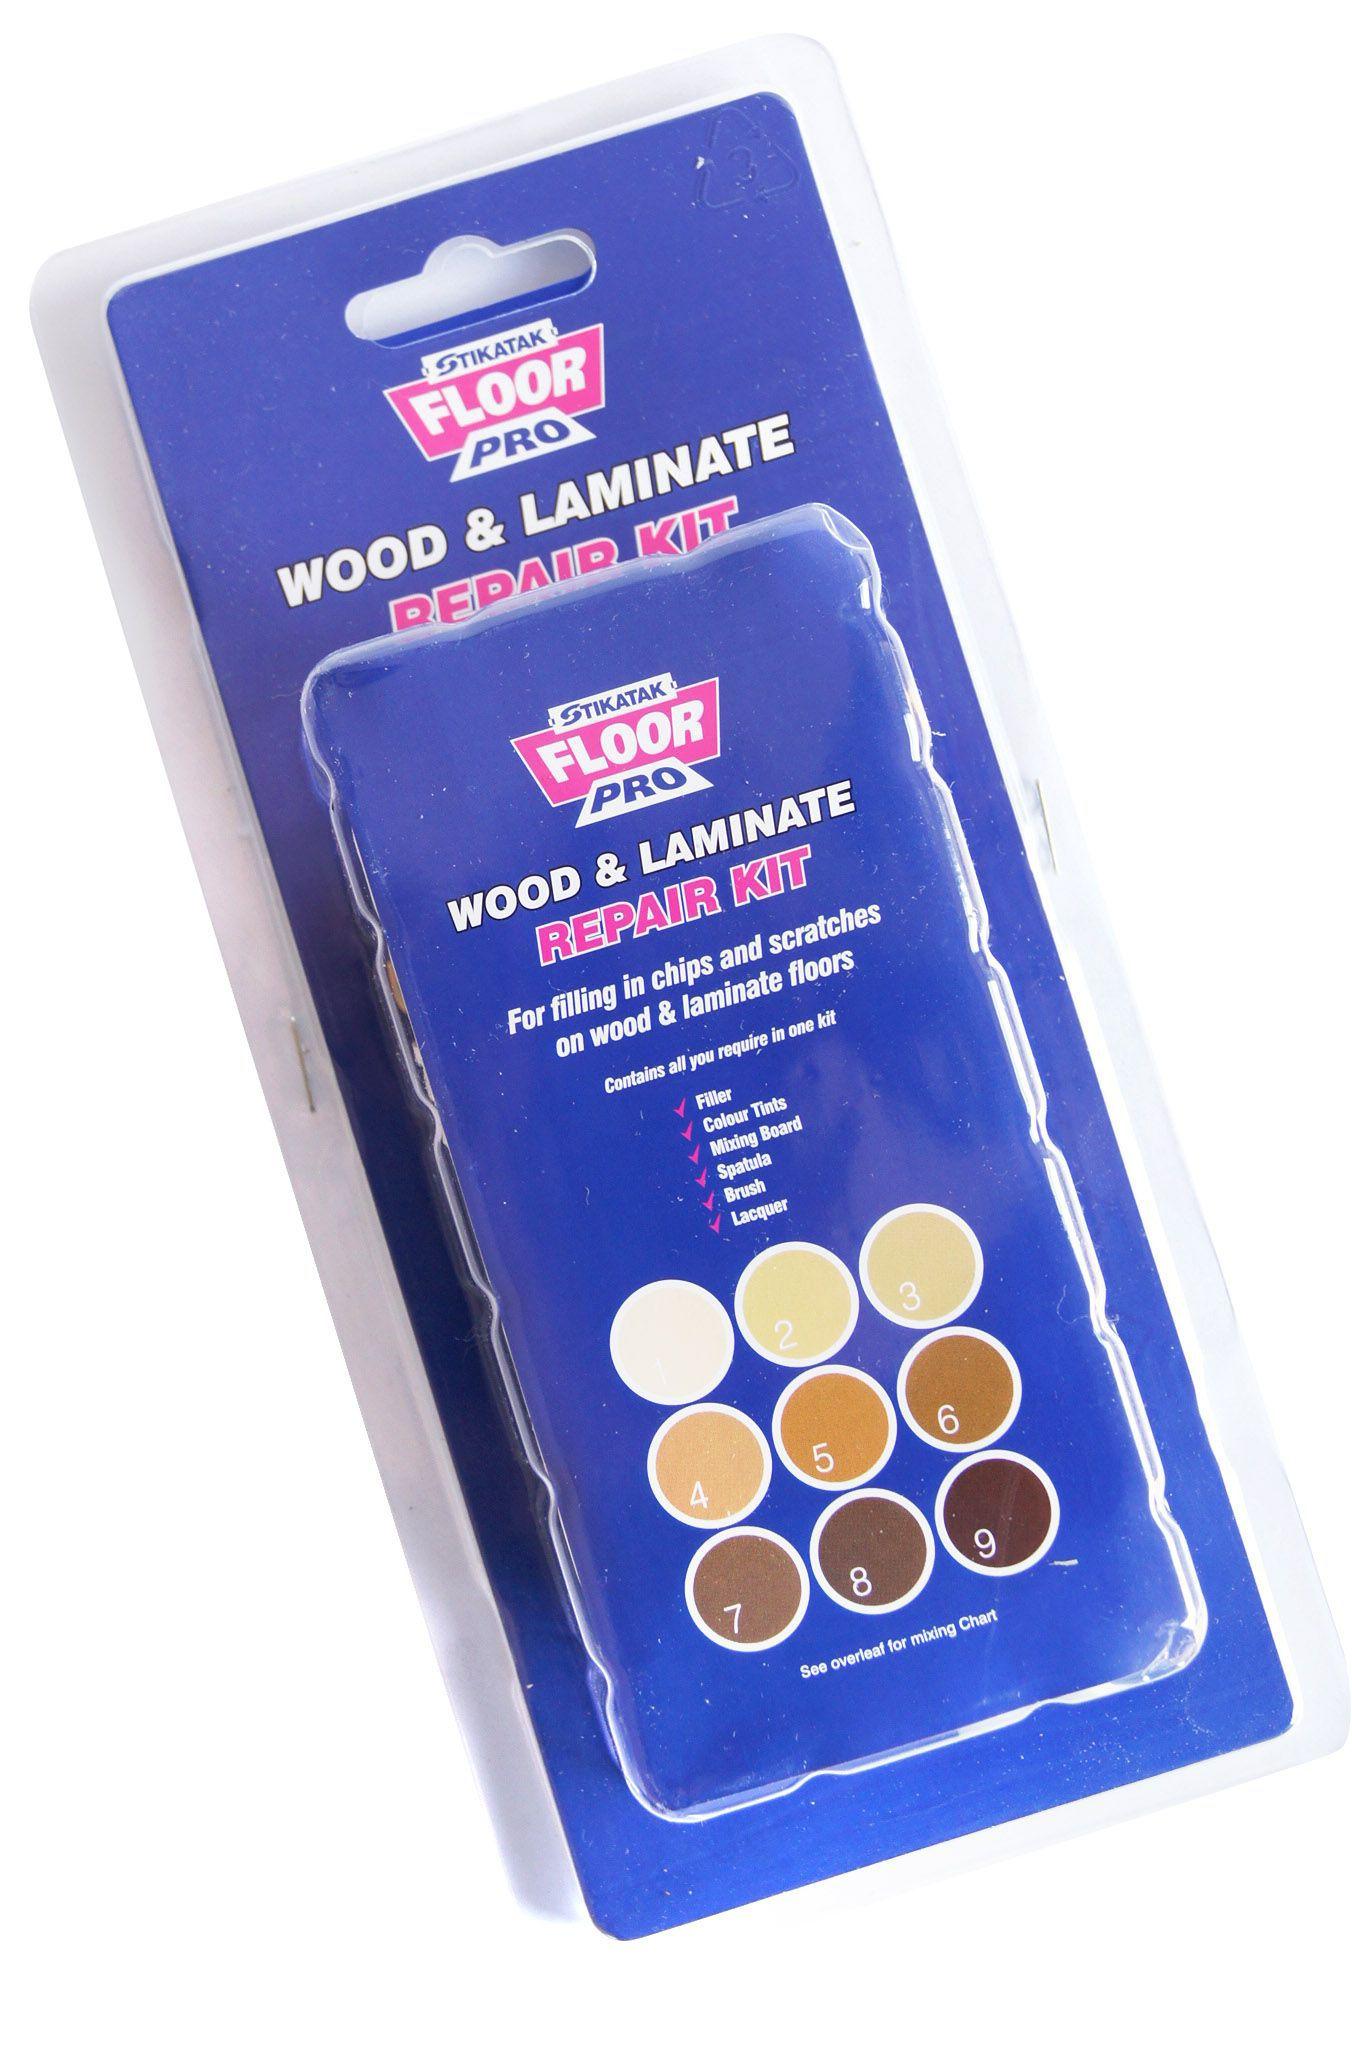 Stikatak Blue Wood Amp Laminate Floor Repair Kit